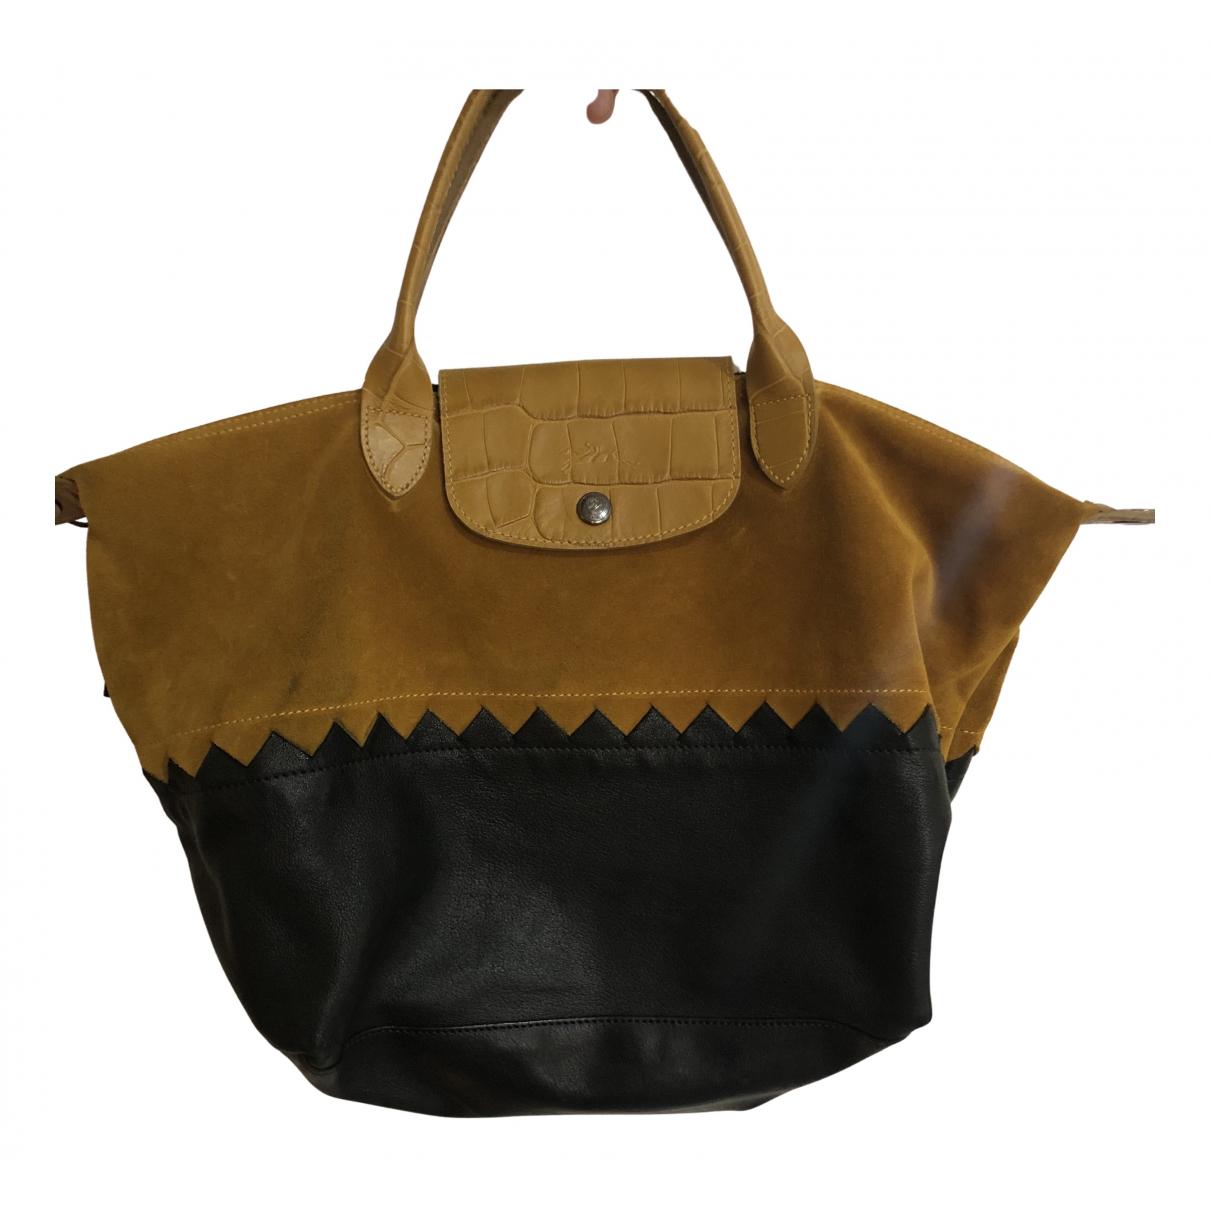 Longchamp Pliage  Black Leather handbag for Women N